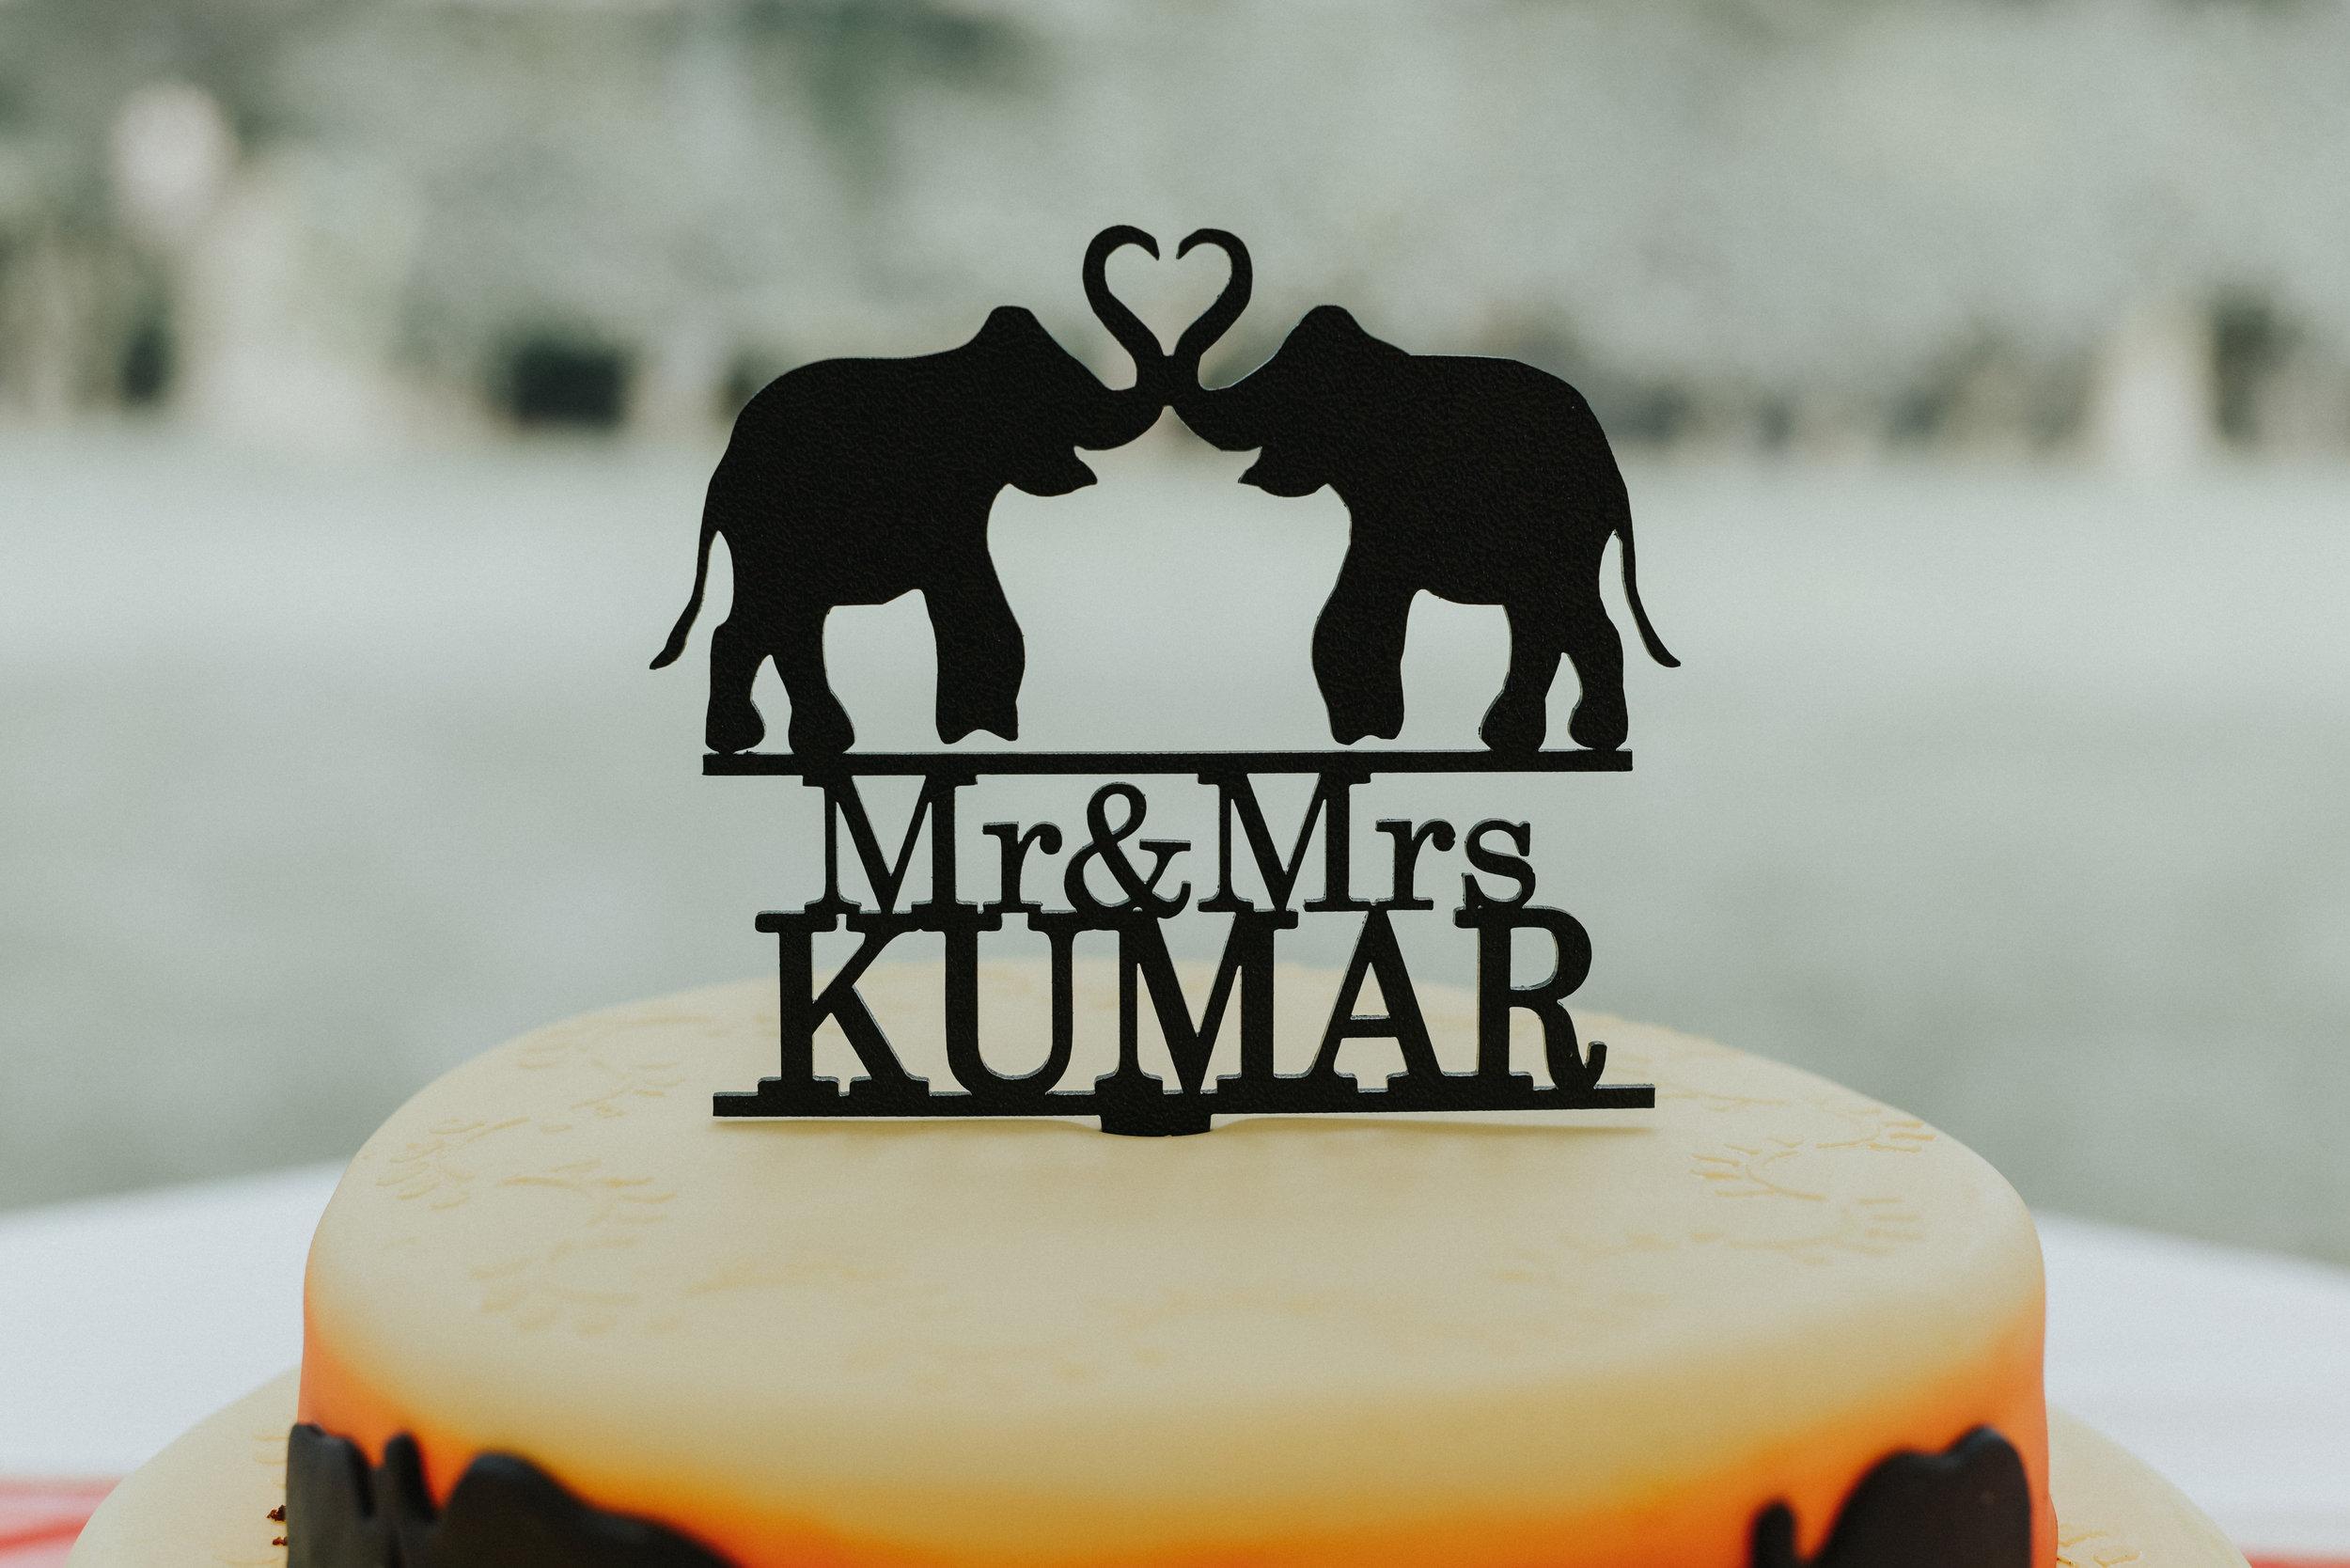 Kumar-611.jpg